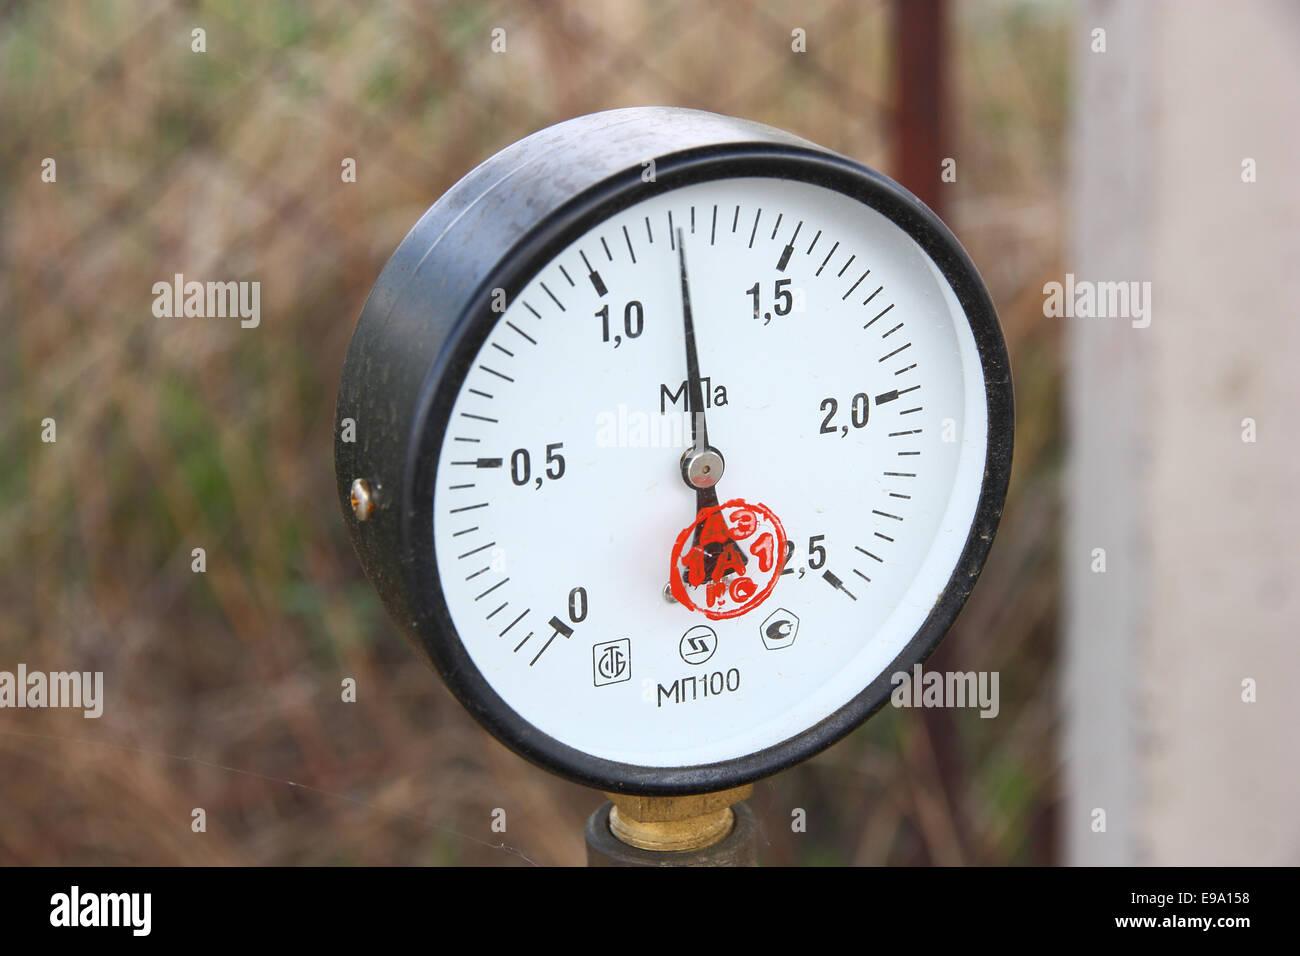 Gas manometer gauge with a black arrow - Stock Image